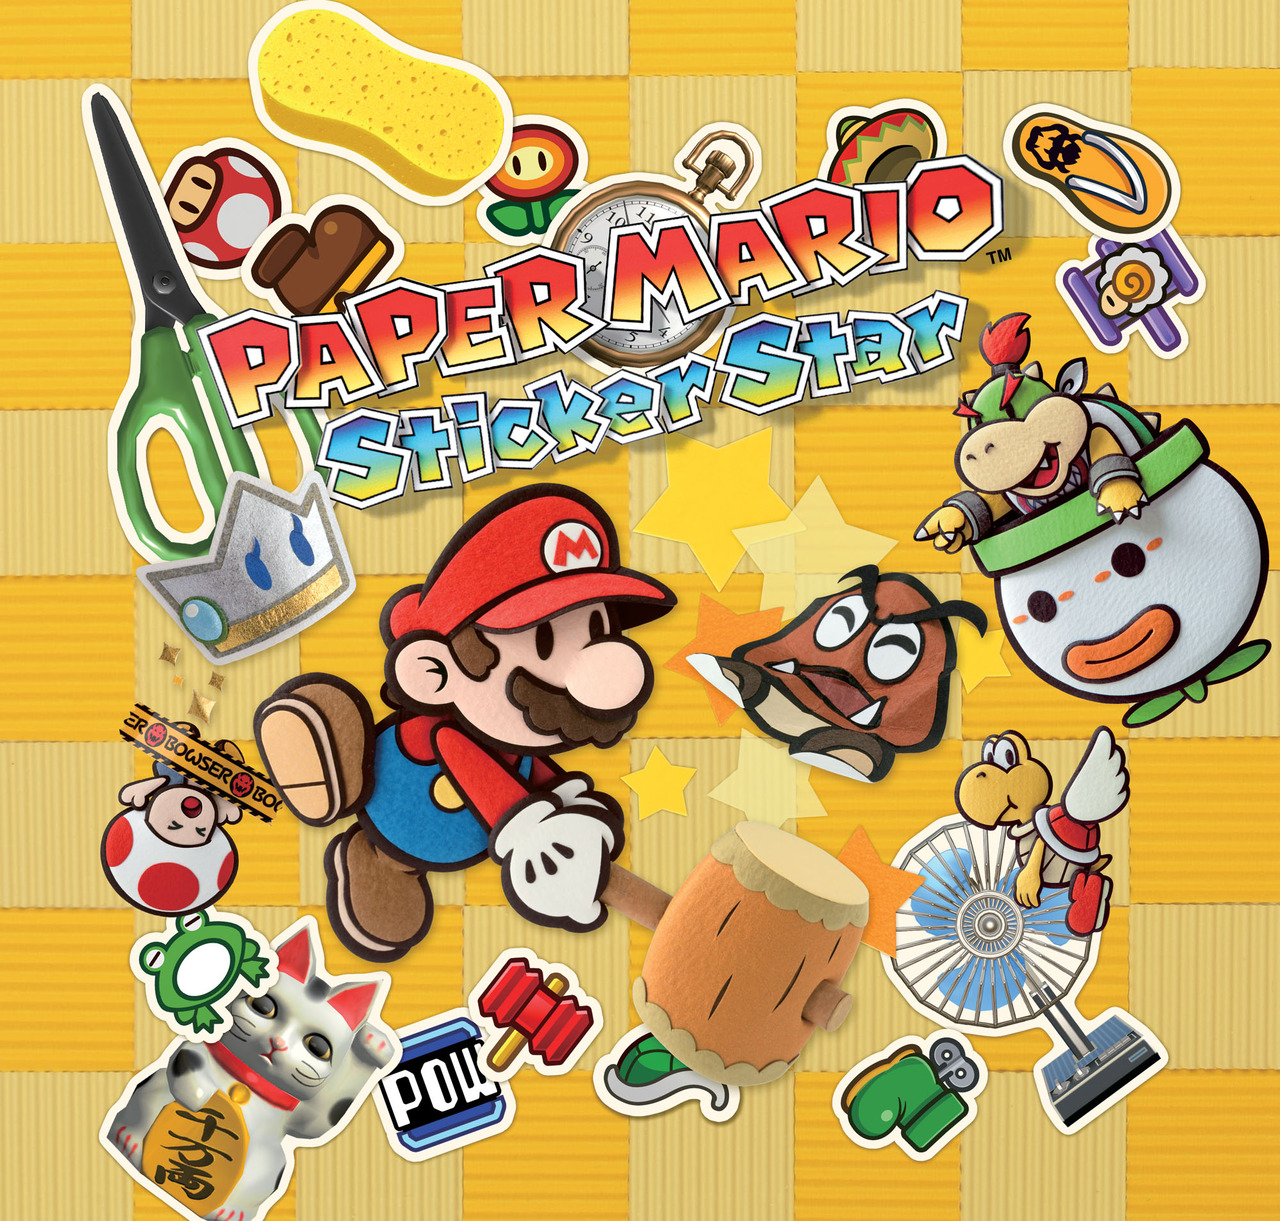 Paper Mario Sticker Star Sticker Book Cover - #traffic-club